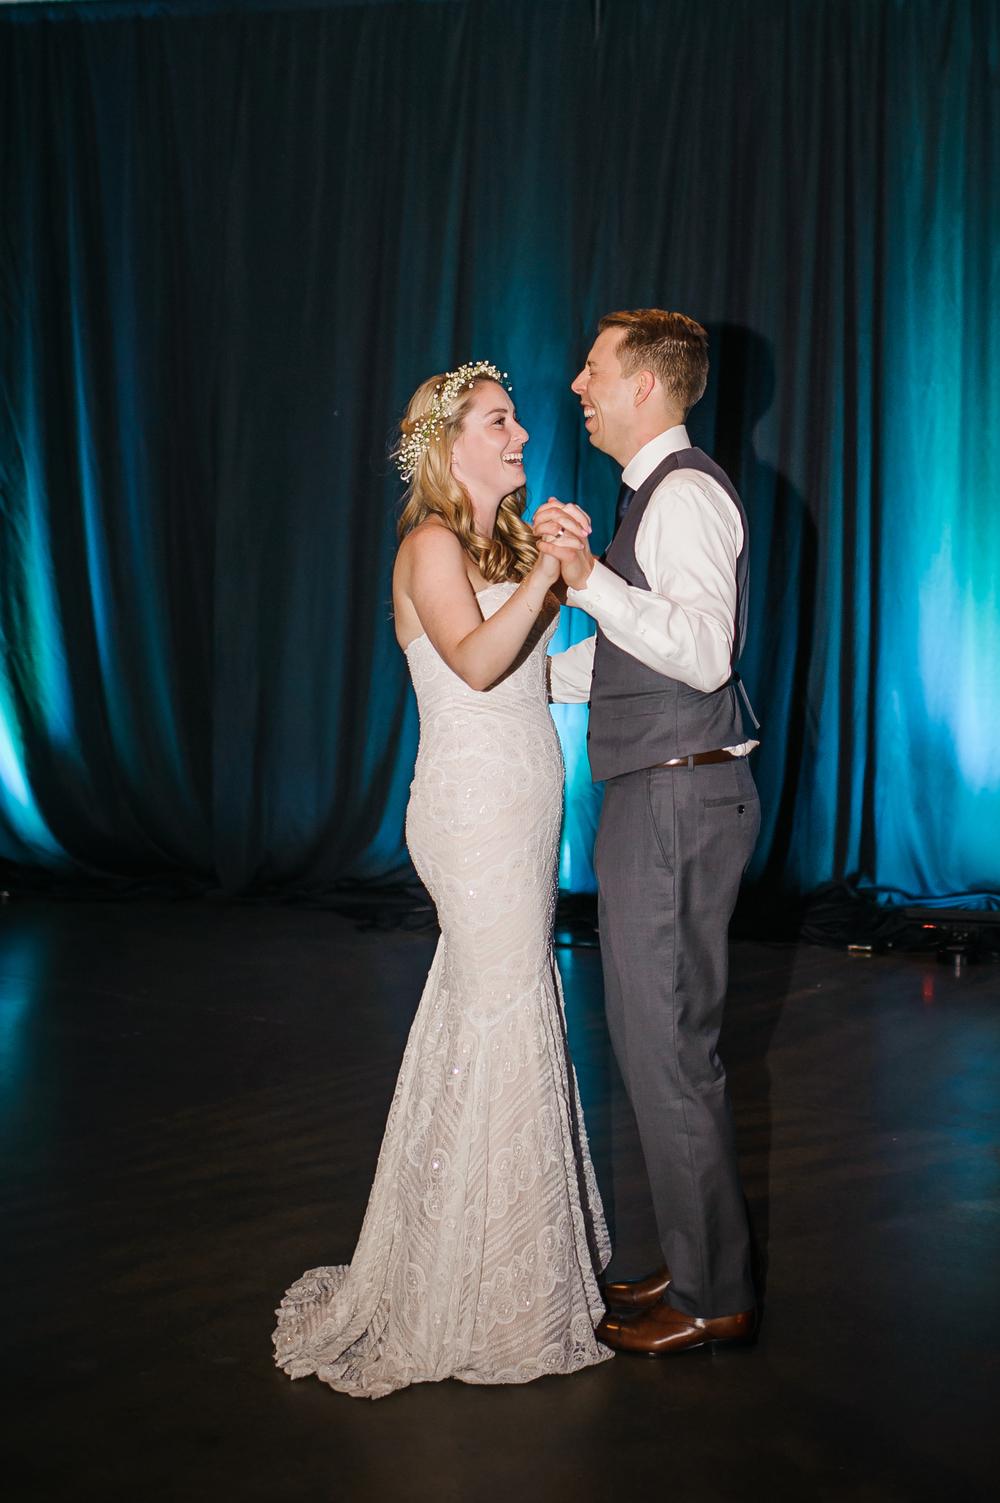 Bridalbliss.com | Portland Wedding | Oregon Event Planning and Design | Honeysuckle Photography | Blum Floral